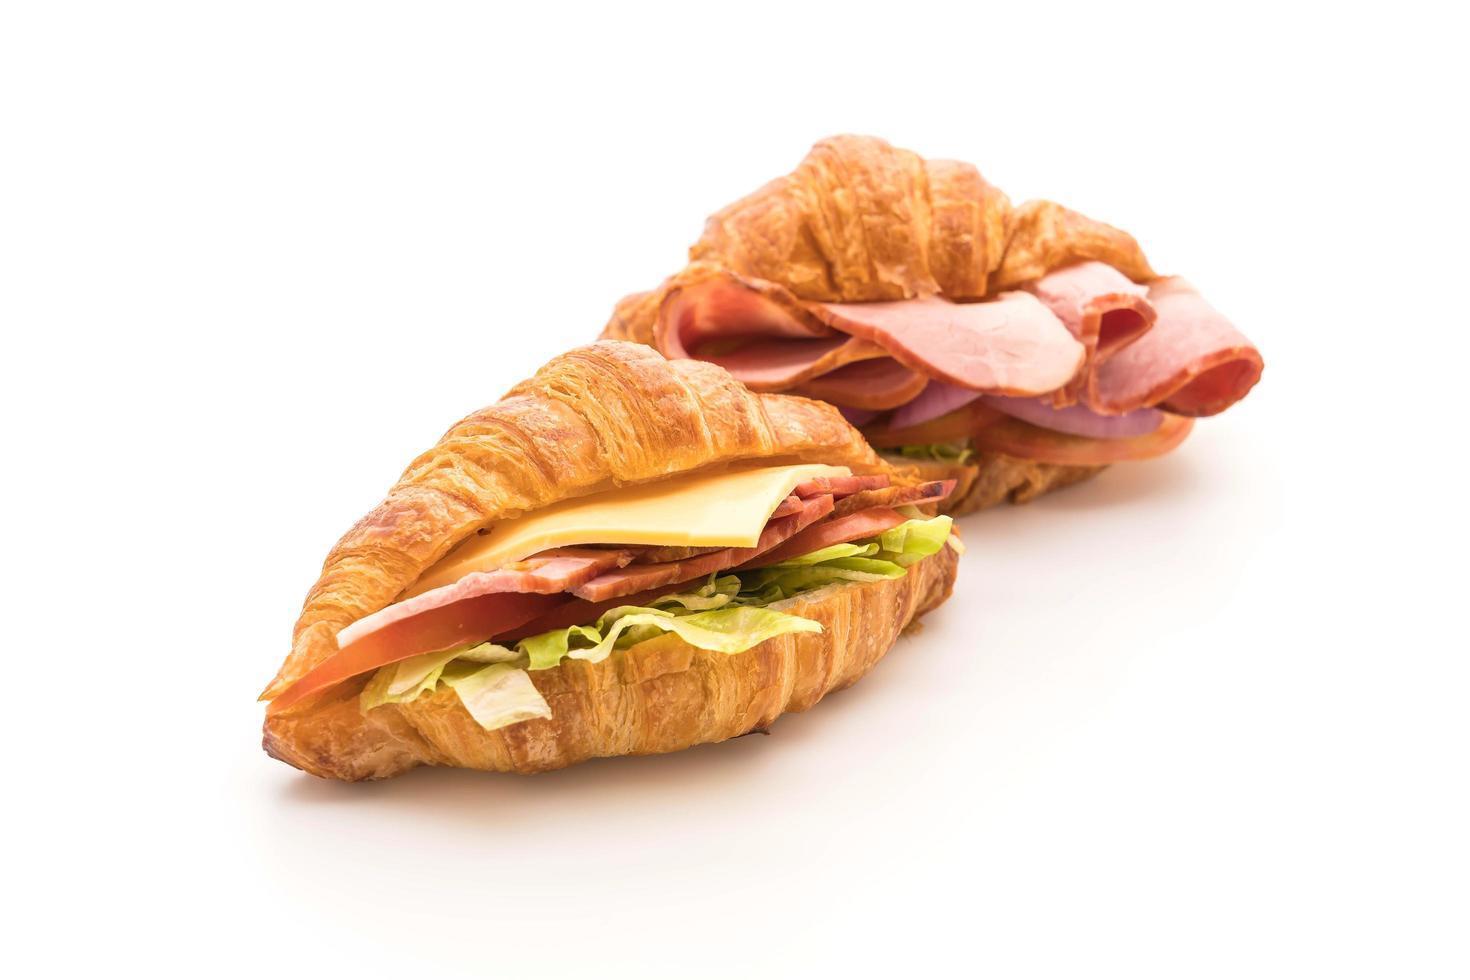 Sándwich de jamón croissant sobre fondo blanco. foto